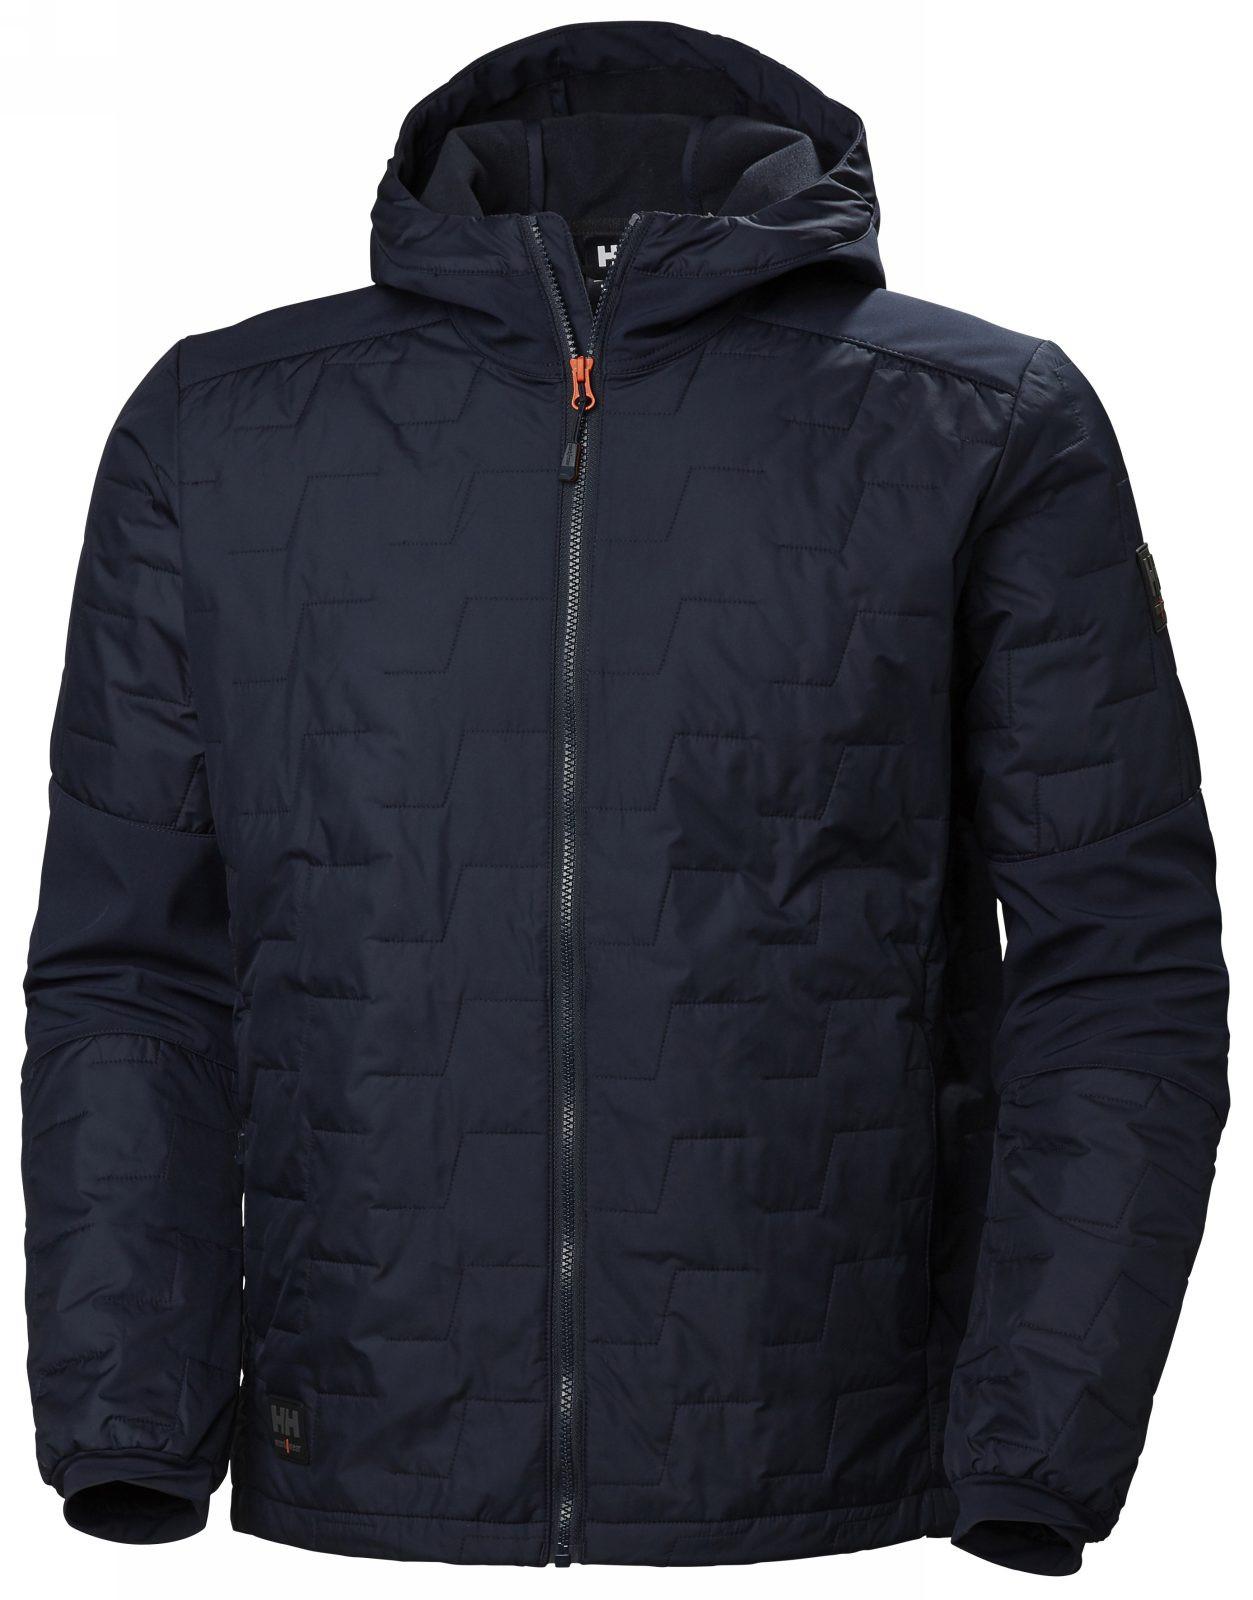 Куртка Helly Hansen Kensington Hooded Lifaloft Jacket - 73230 (Navy; L)